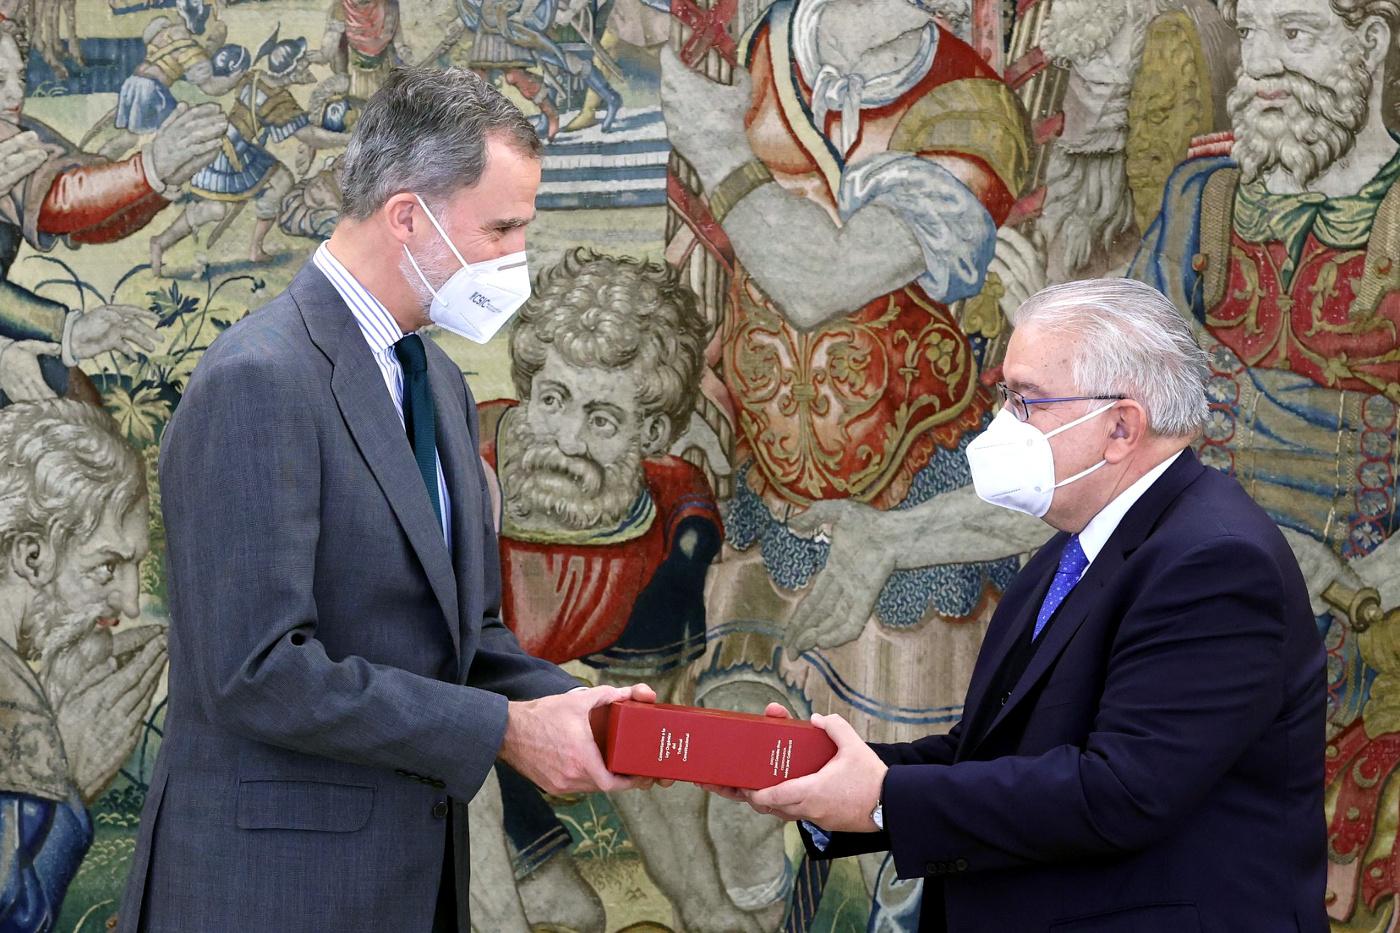 King Felipe met with the the president of the Constitutional Court, Juan José González Rivas